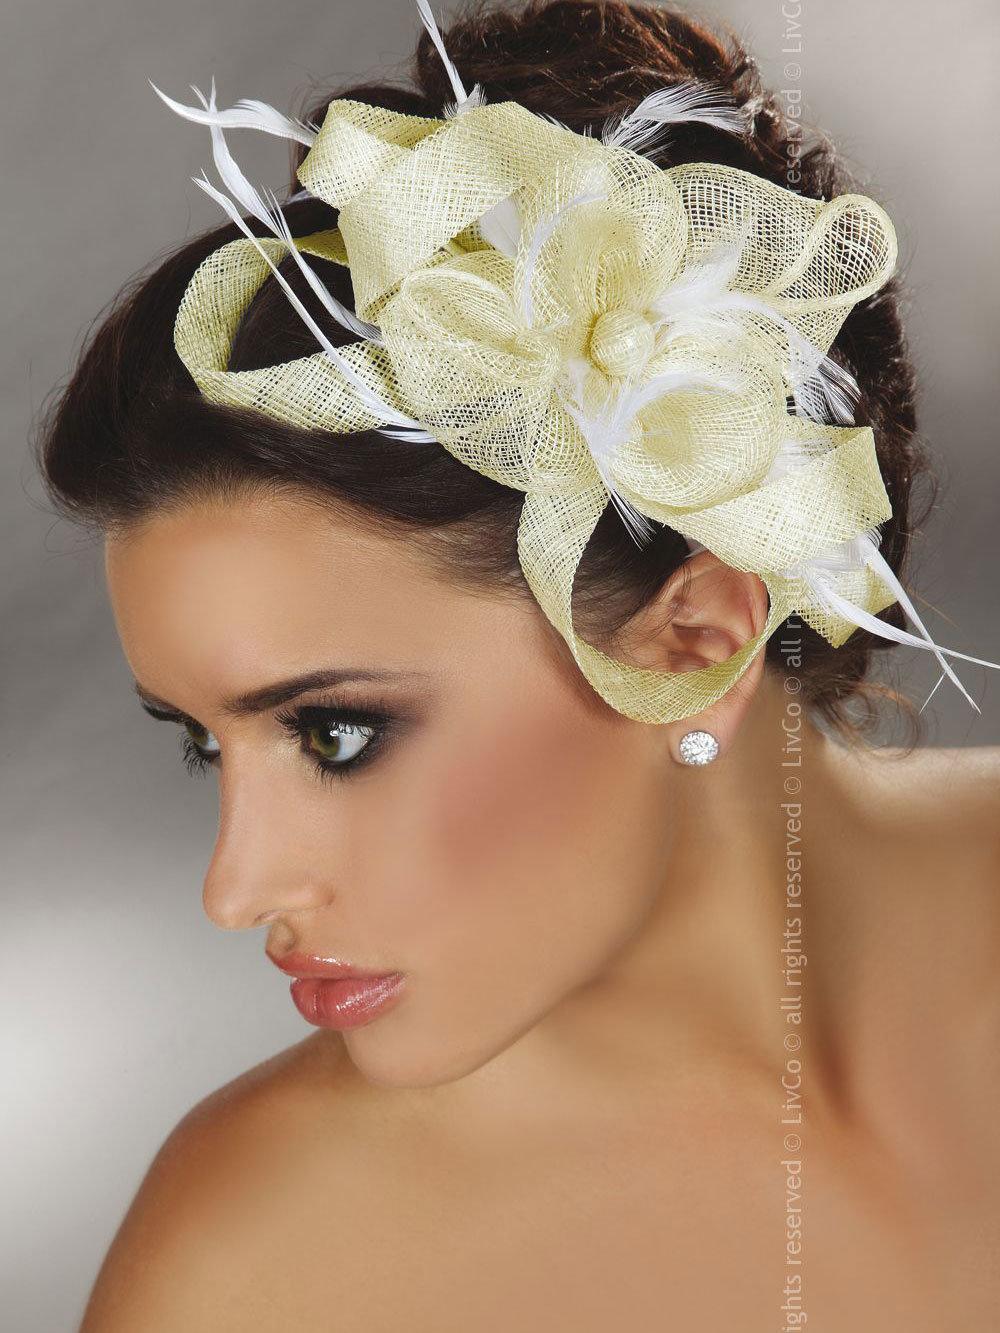 LivCo Palarie Mini Top Hat Model 29 Ivory